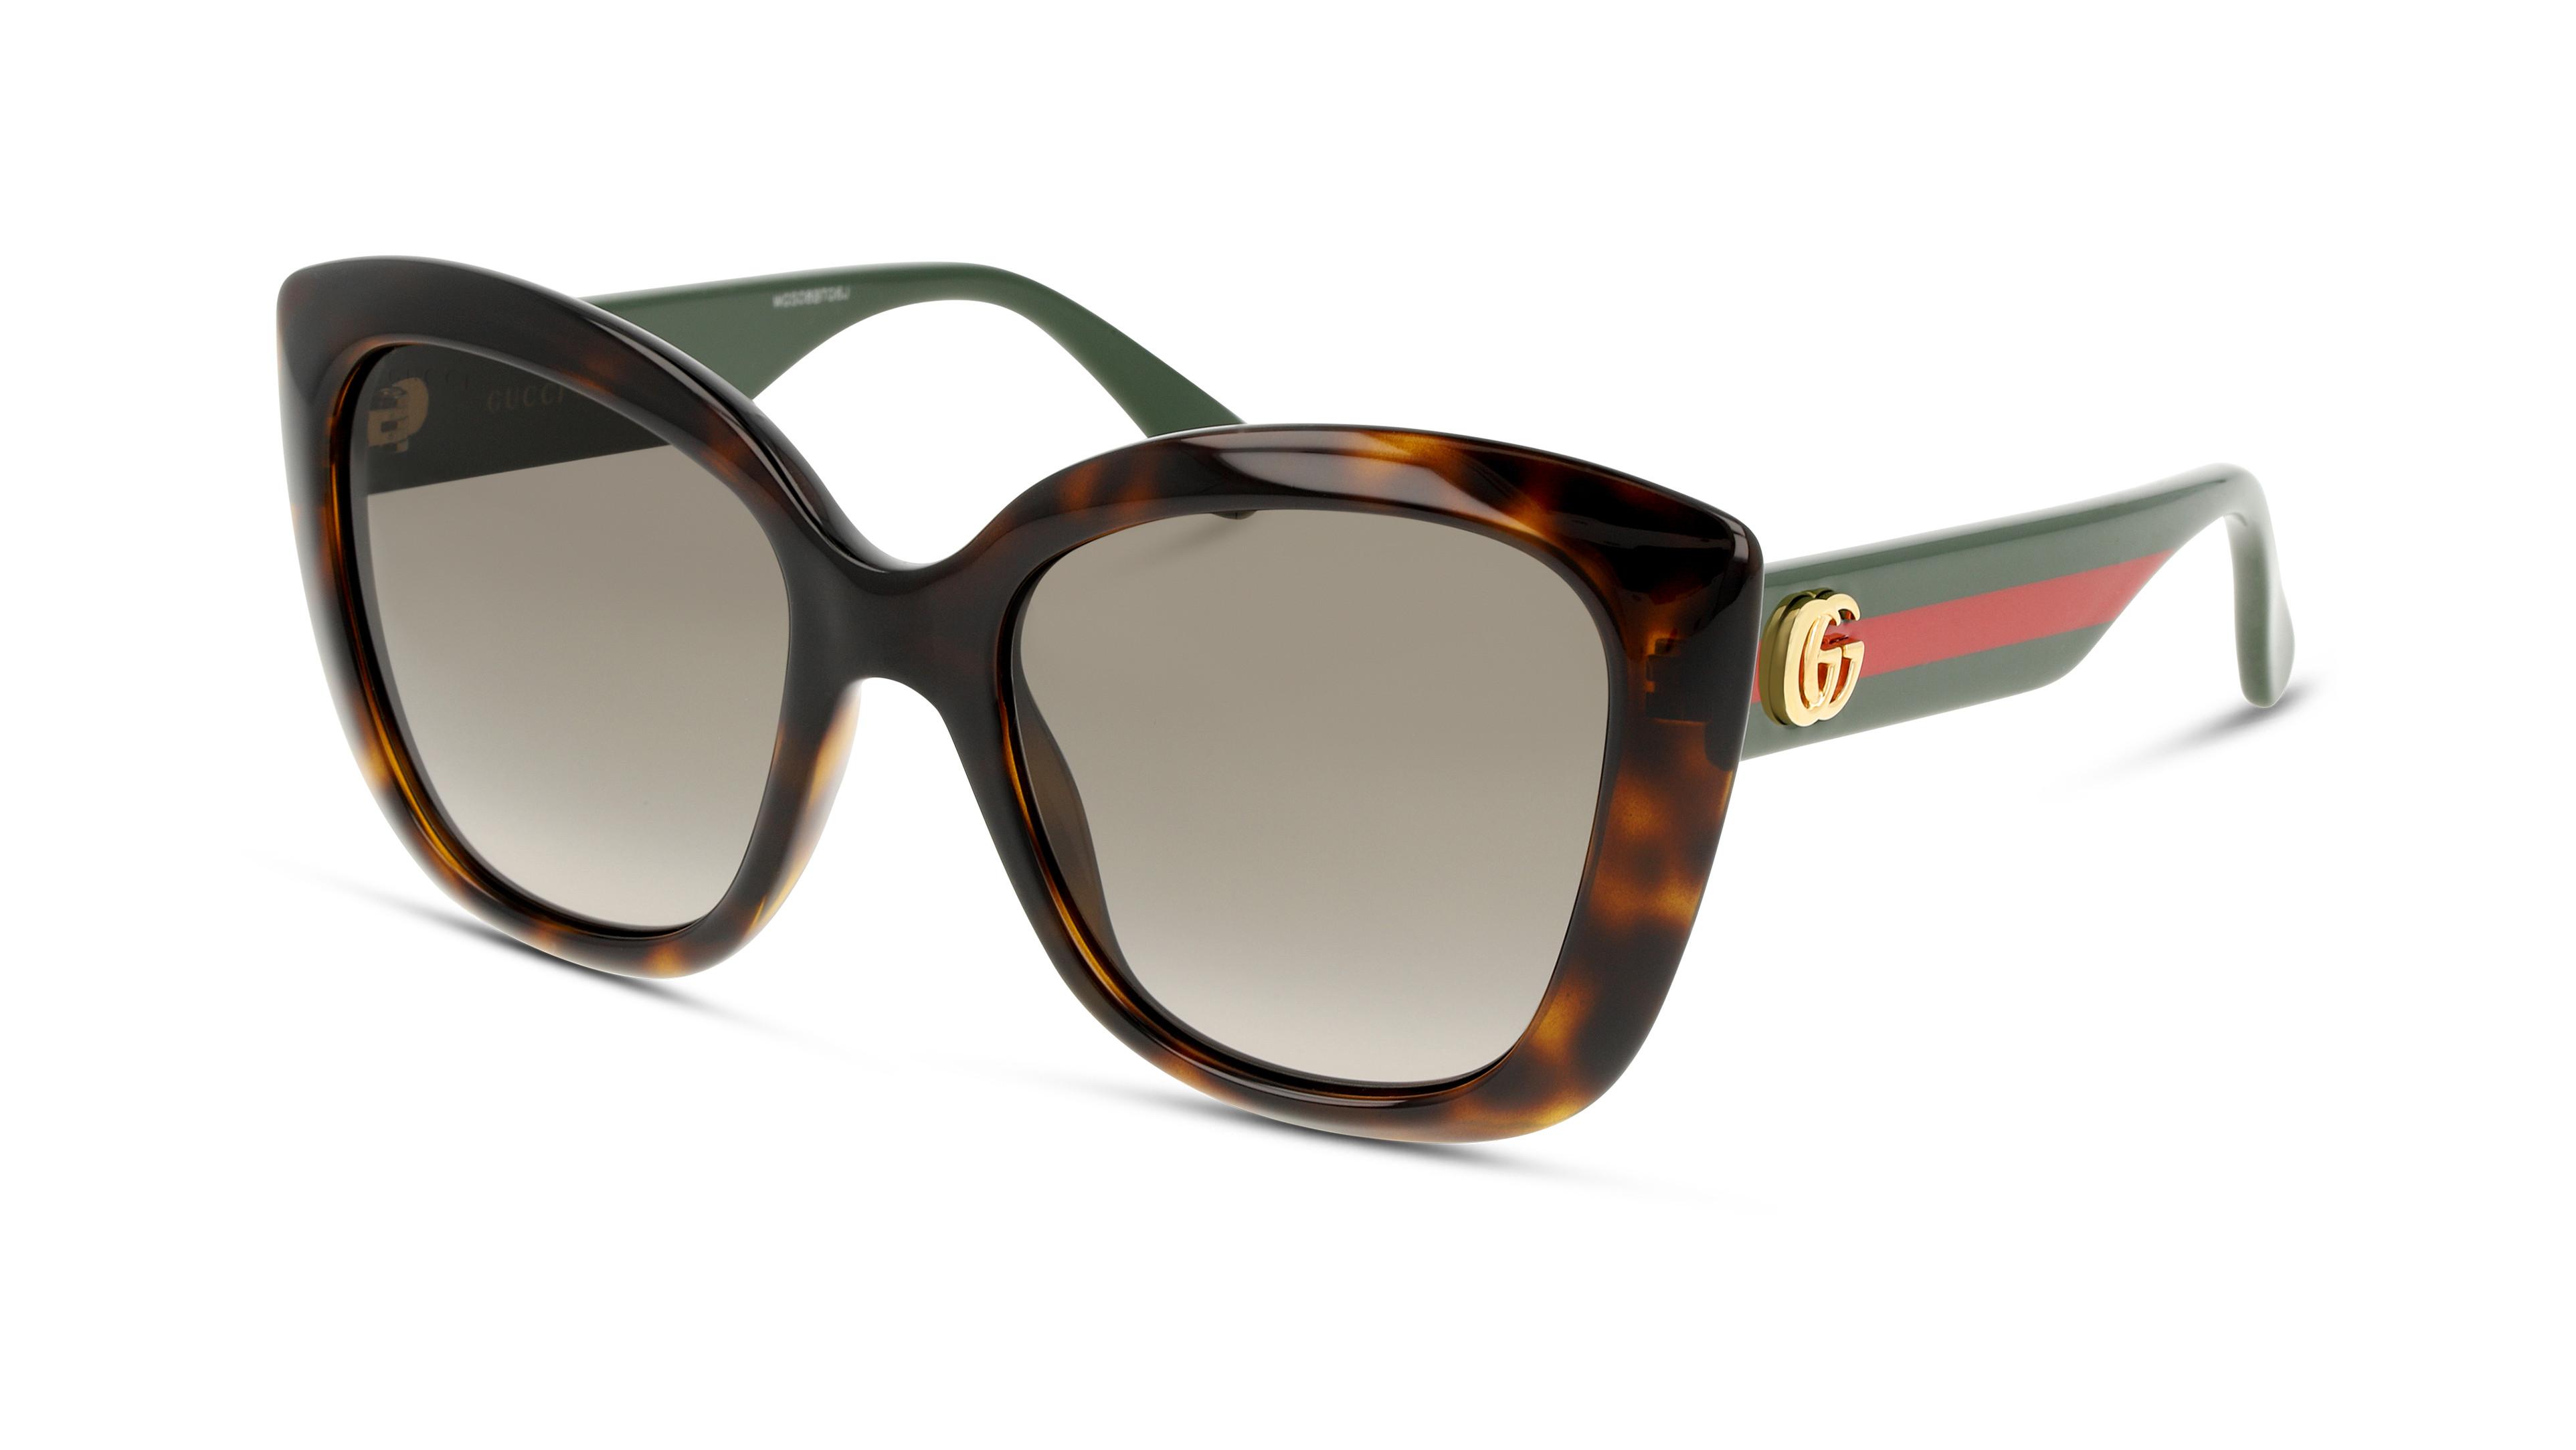 8056376336658-angle-sonnenbrille-gucci-gg0860s-havana-green-brown